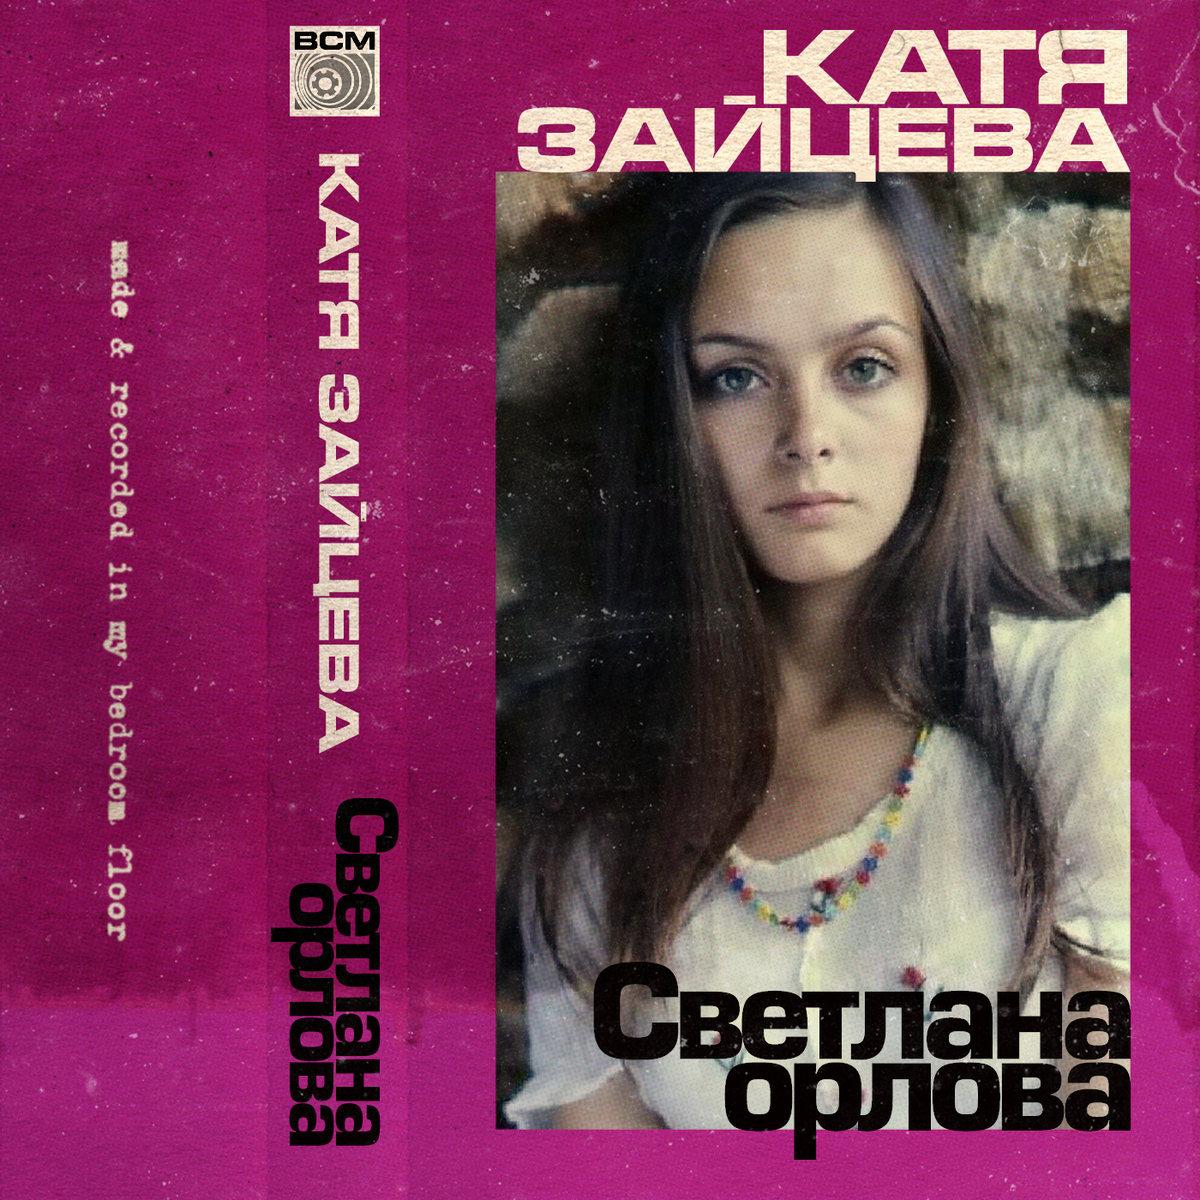 Svetlana Orlova: biography, photos and interesting facts 7